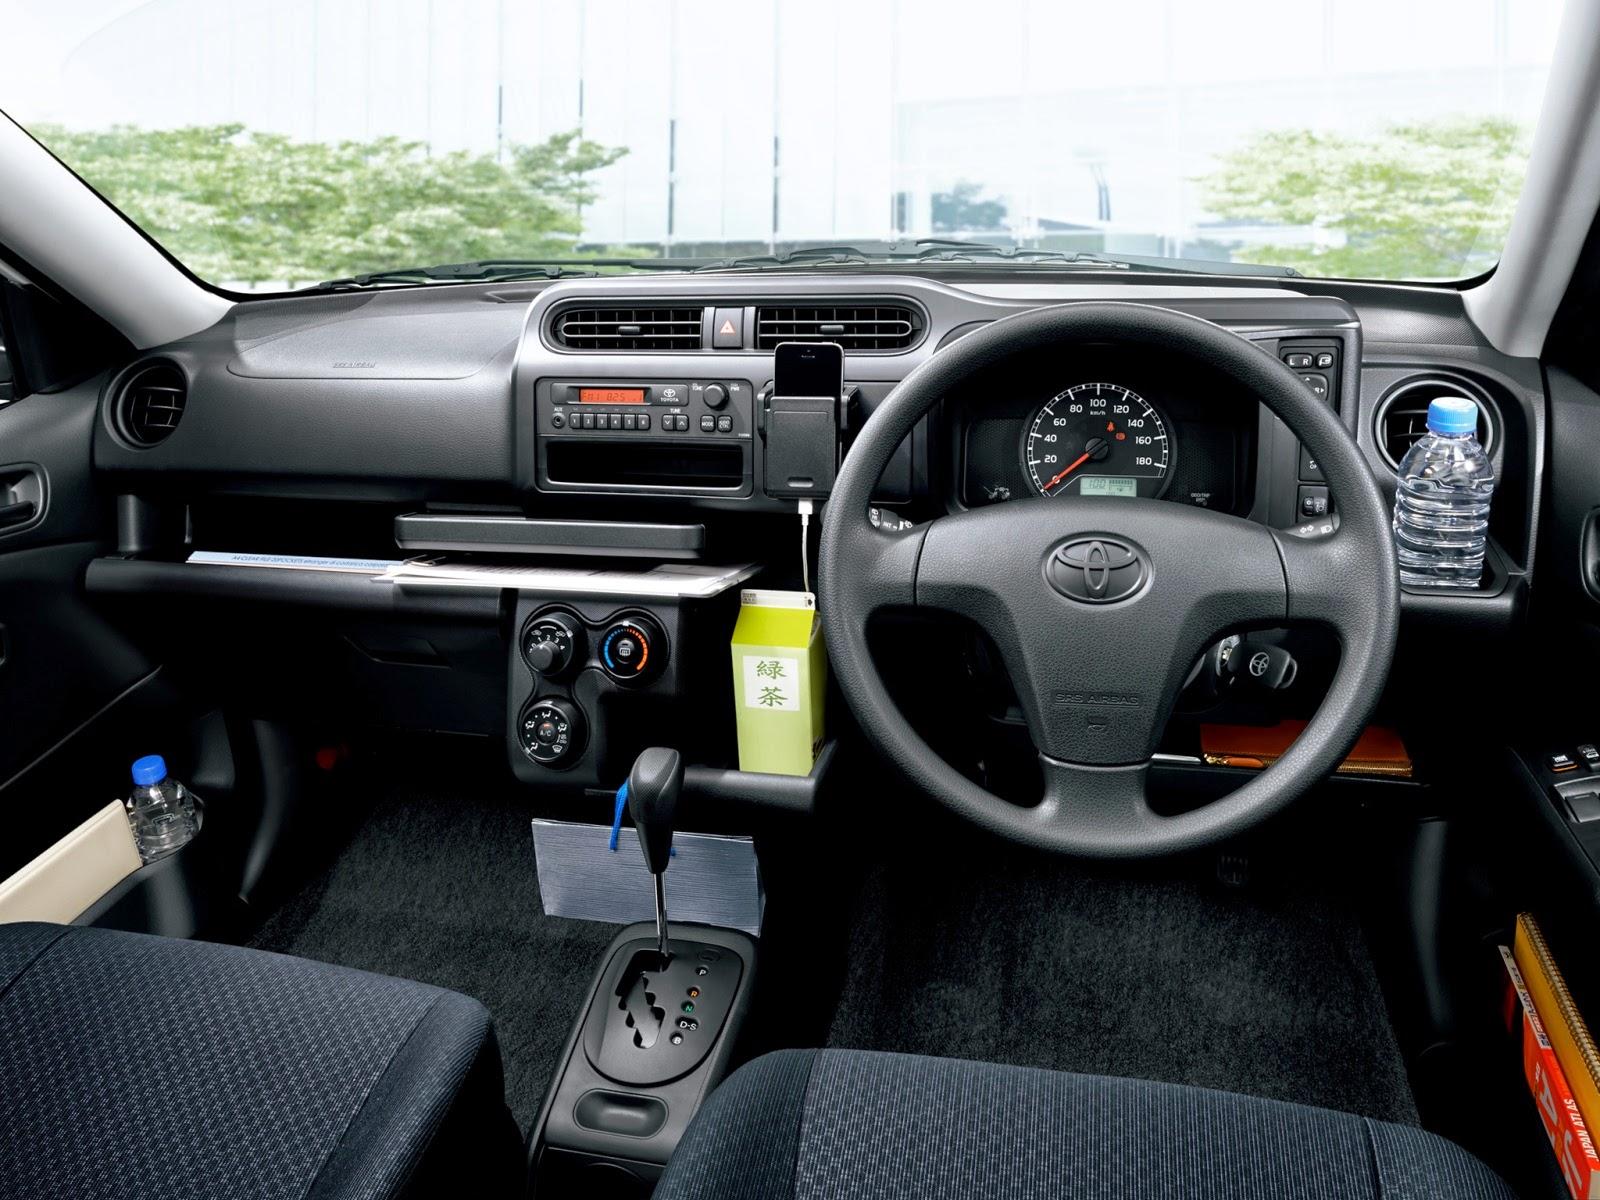 2014 toyota probox and succeed \u2013 updated practicality auto review Toyota New Probox 2018